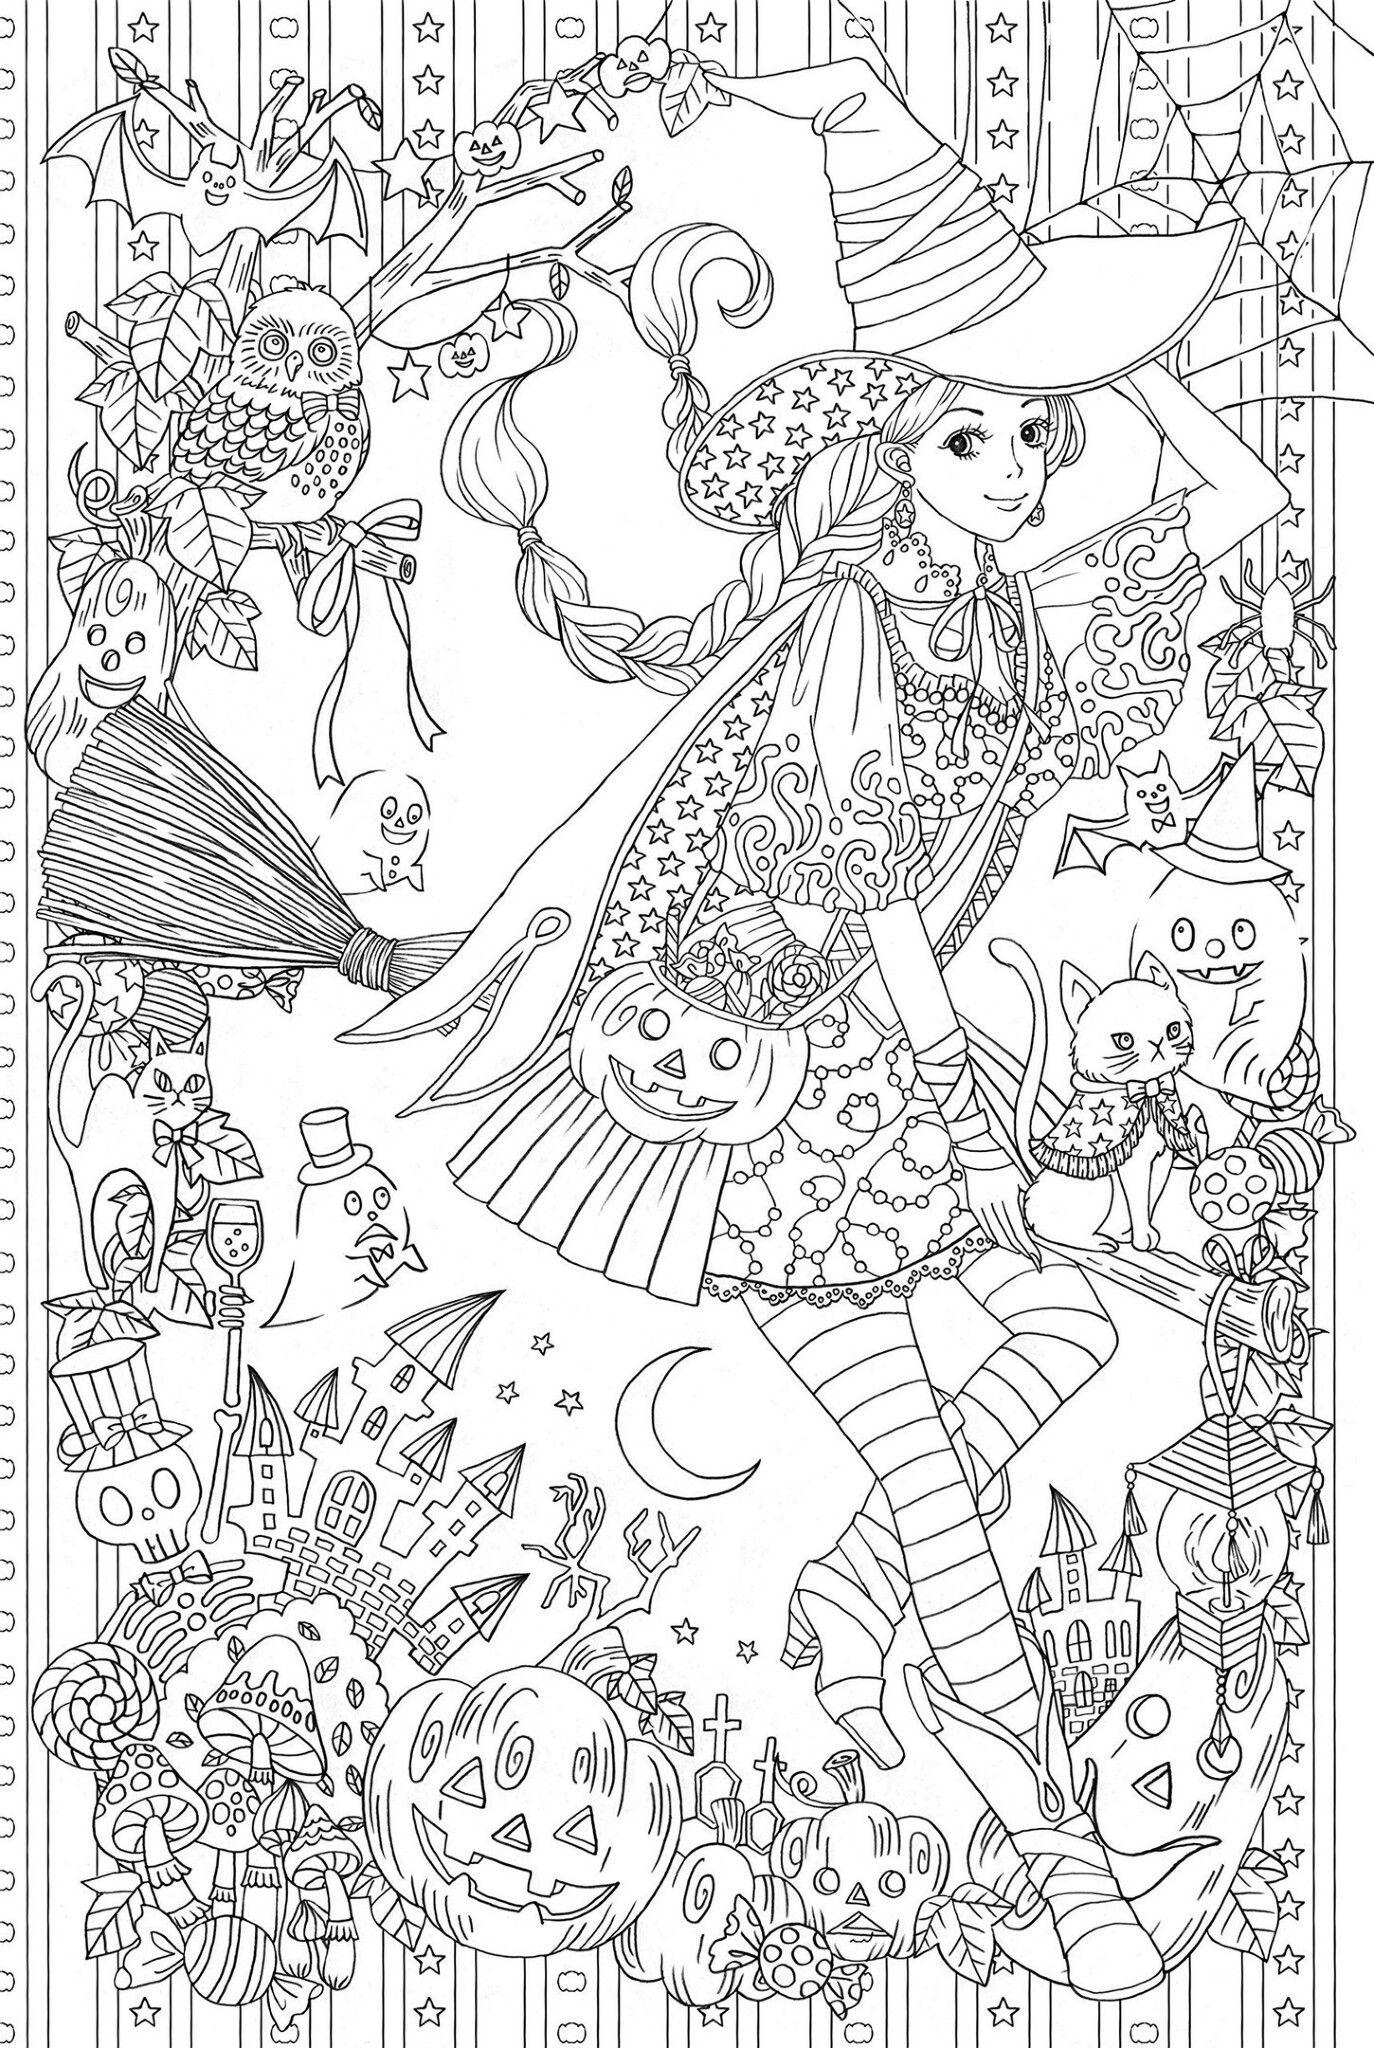 Pin de Gwen en Coloring and drawing | Pinterest | Colorear, Mandalas ...